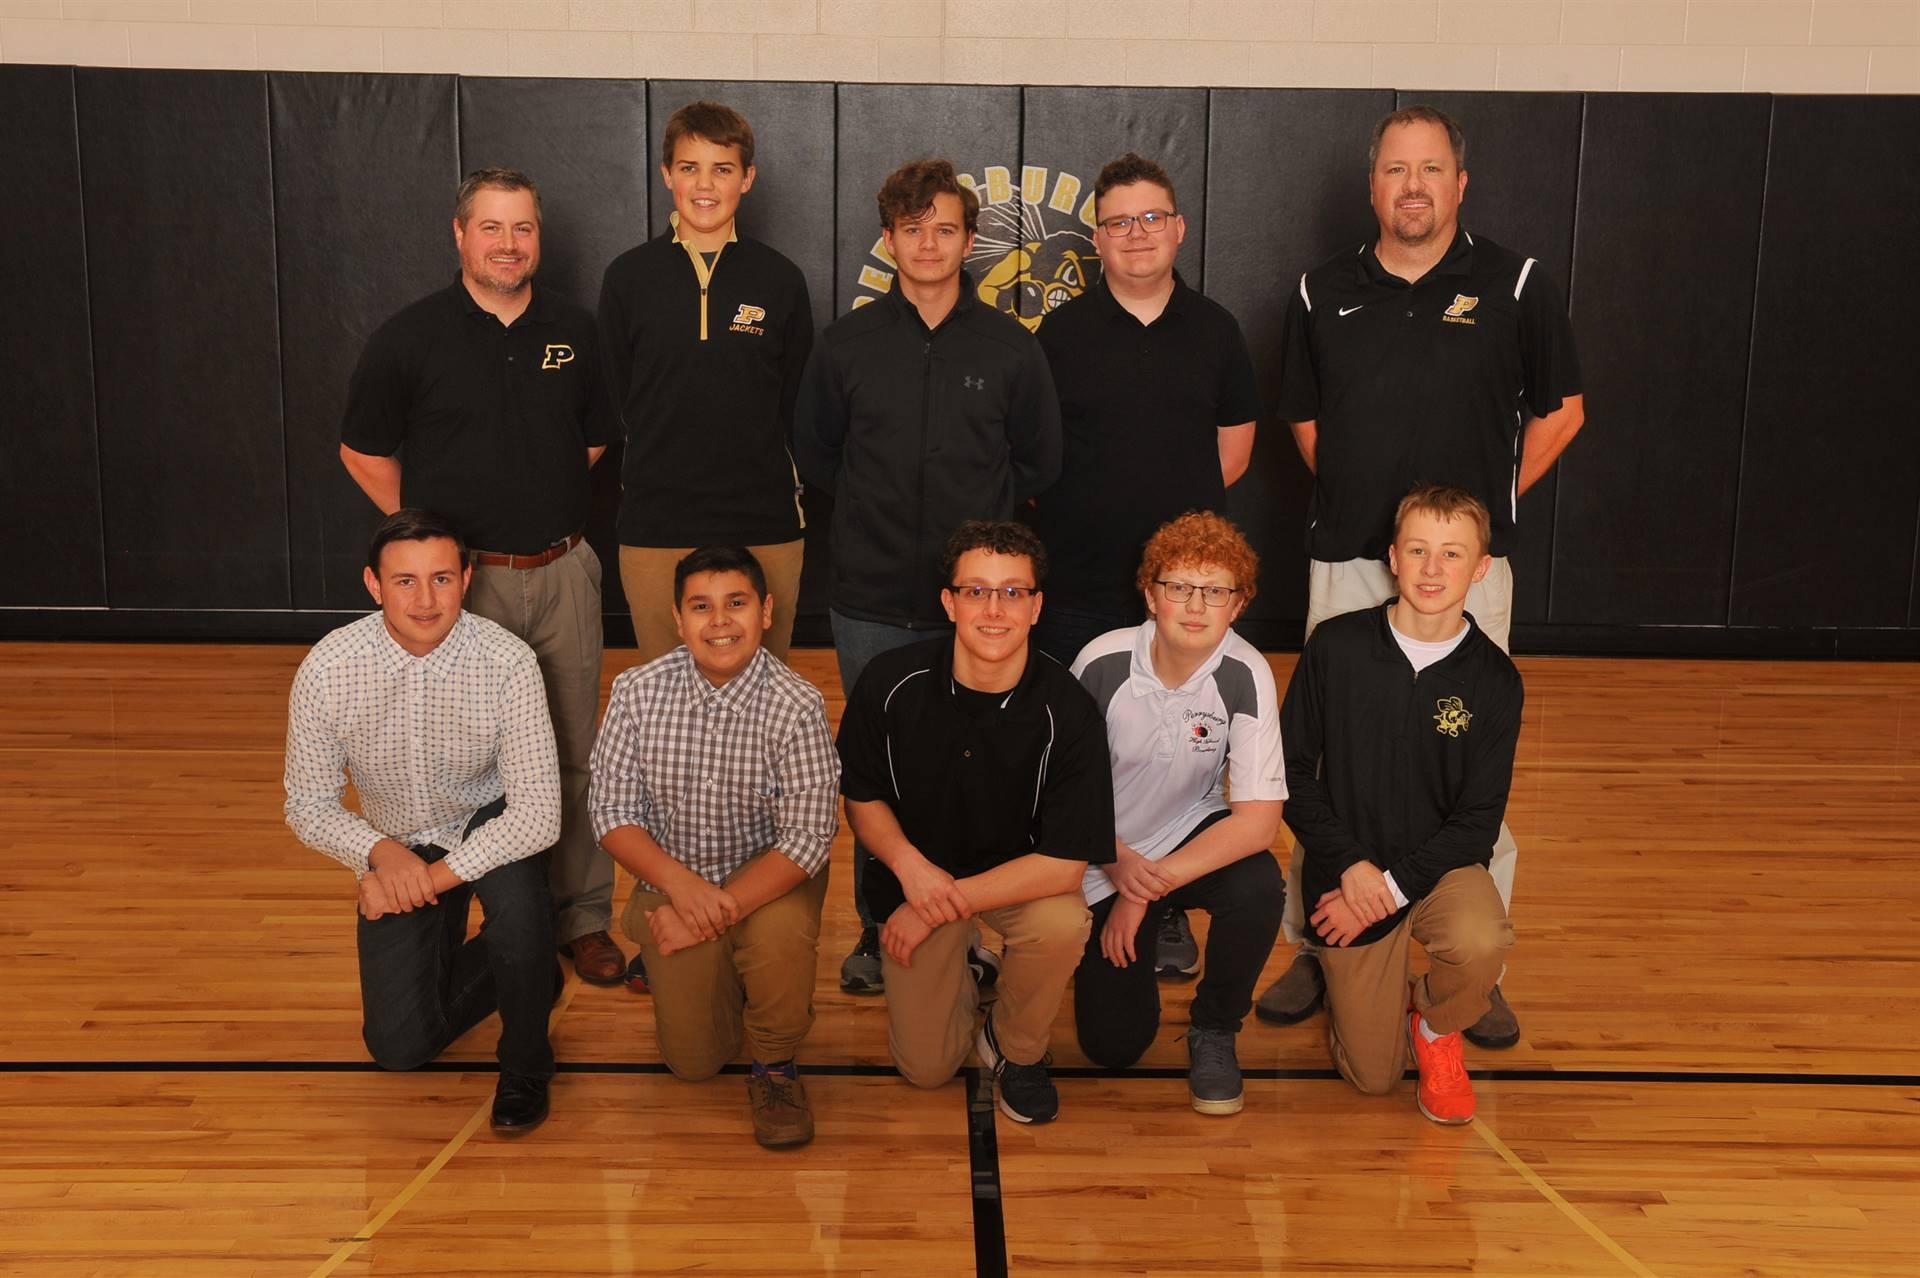 PHS JV Boys Bowling Team